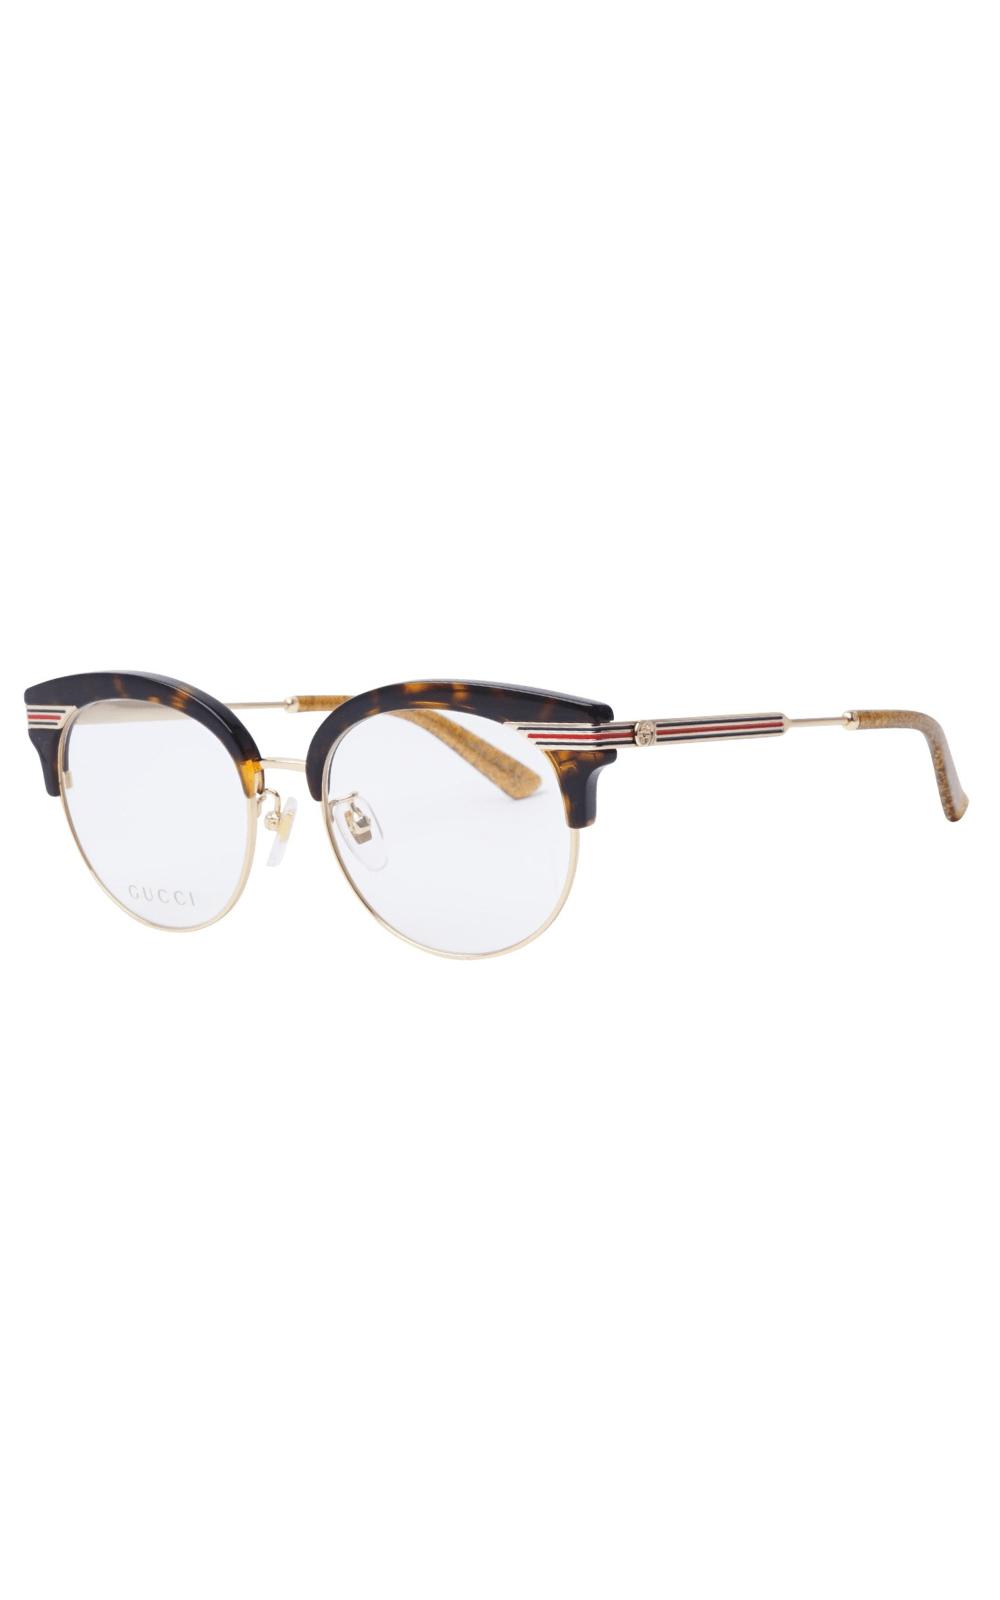 Óculos de Grau Gucci 0285 OA 002. undefined a02b51badf